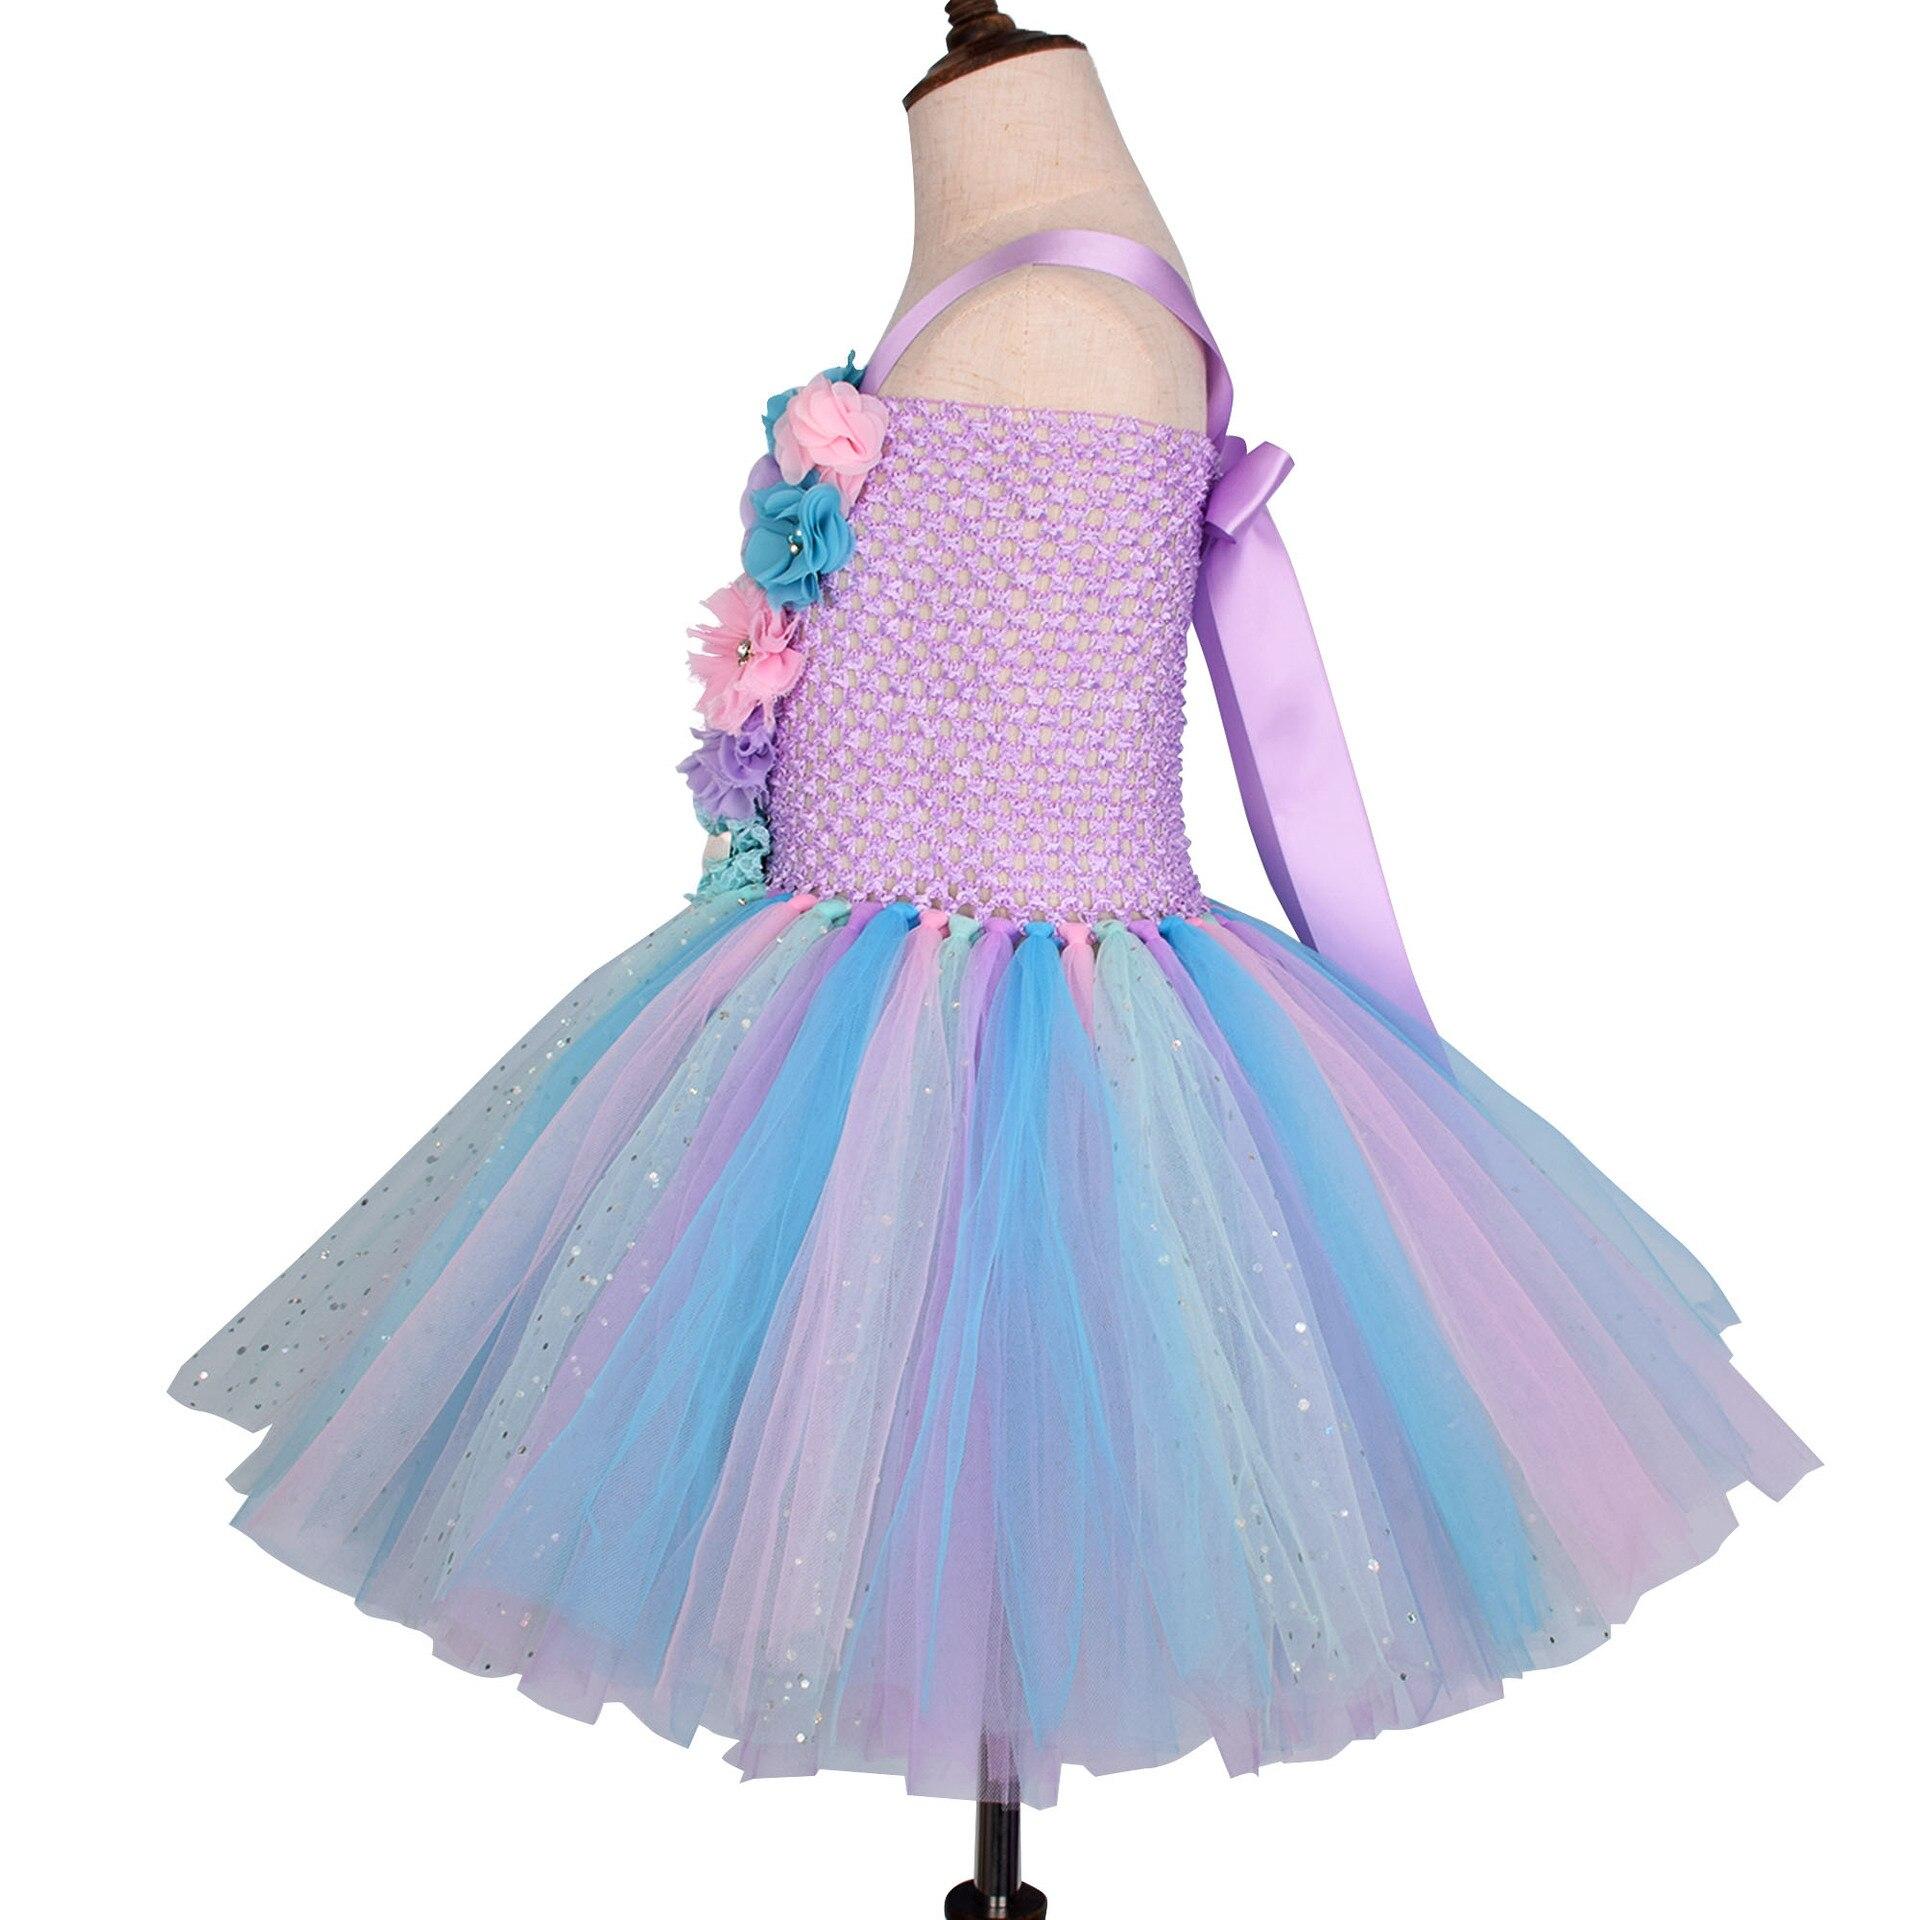 Girls Pastel Mermaid Tutu Dress Under the Sea Theme Birthday Party Costume with Flower Headband Ocean Flower Dresses 1-12Y 2